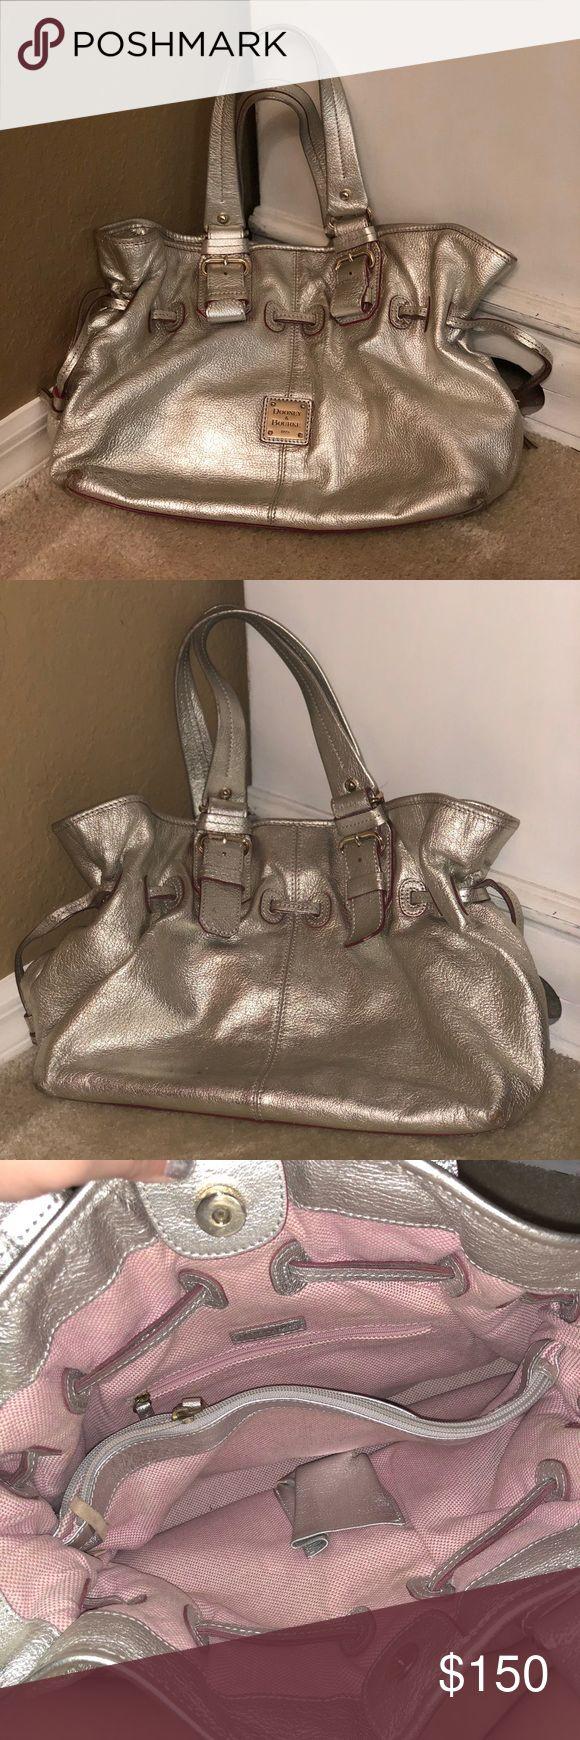 Dooney & Bourke, large silver shoulder bag Large dooney & bourke silver handbag with a large center divider pocket. In great condition, lightly worn. Authentic. Soft leather. Make an offer!!! Dooney & Bourke Bags Shoulder Bags